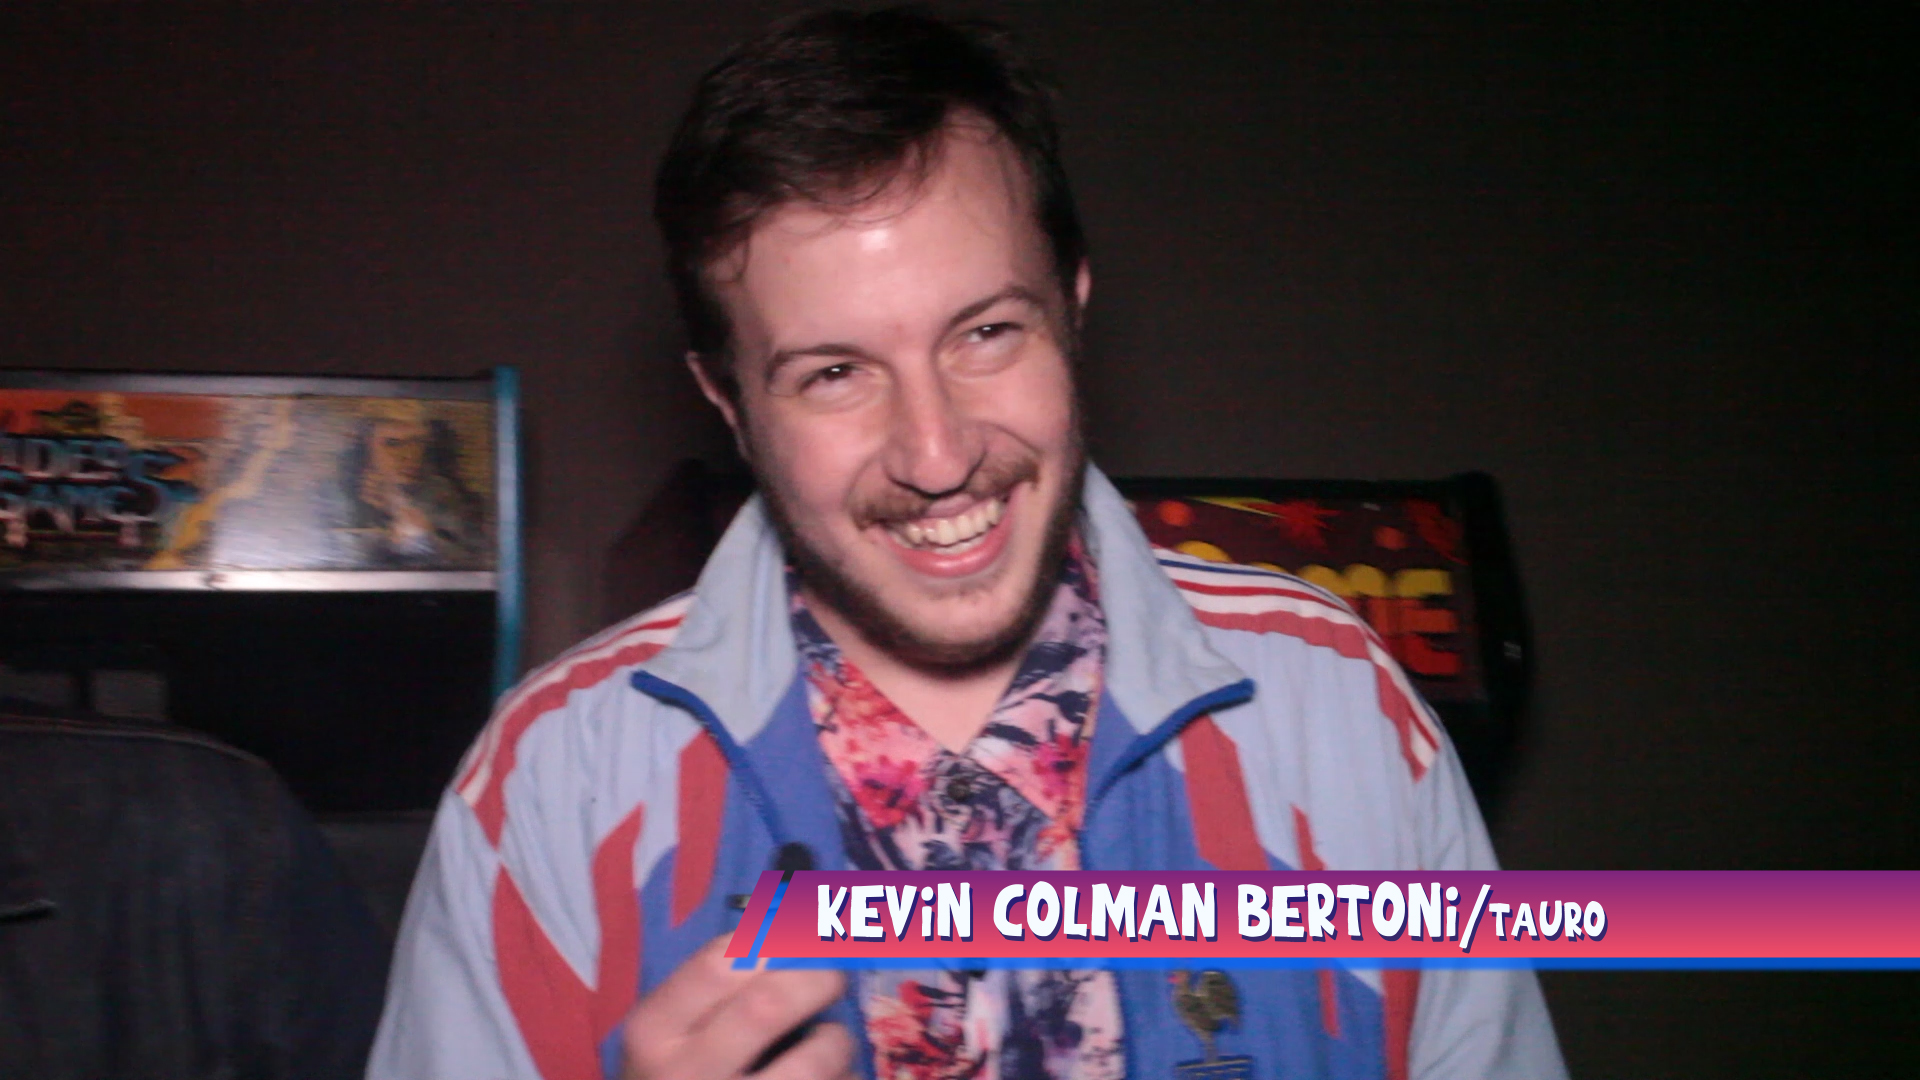 TAURO/ KEVIN COLMAN BERTONI